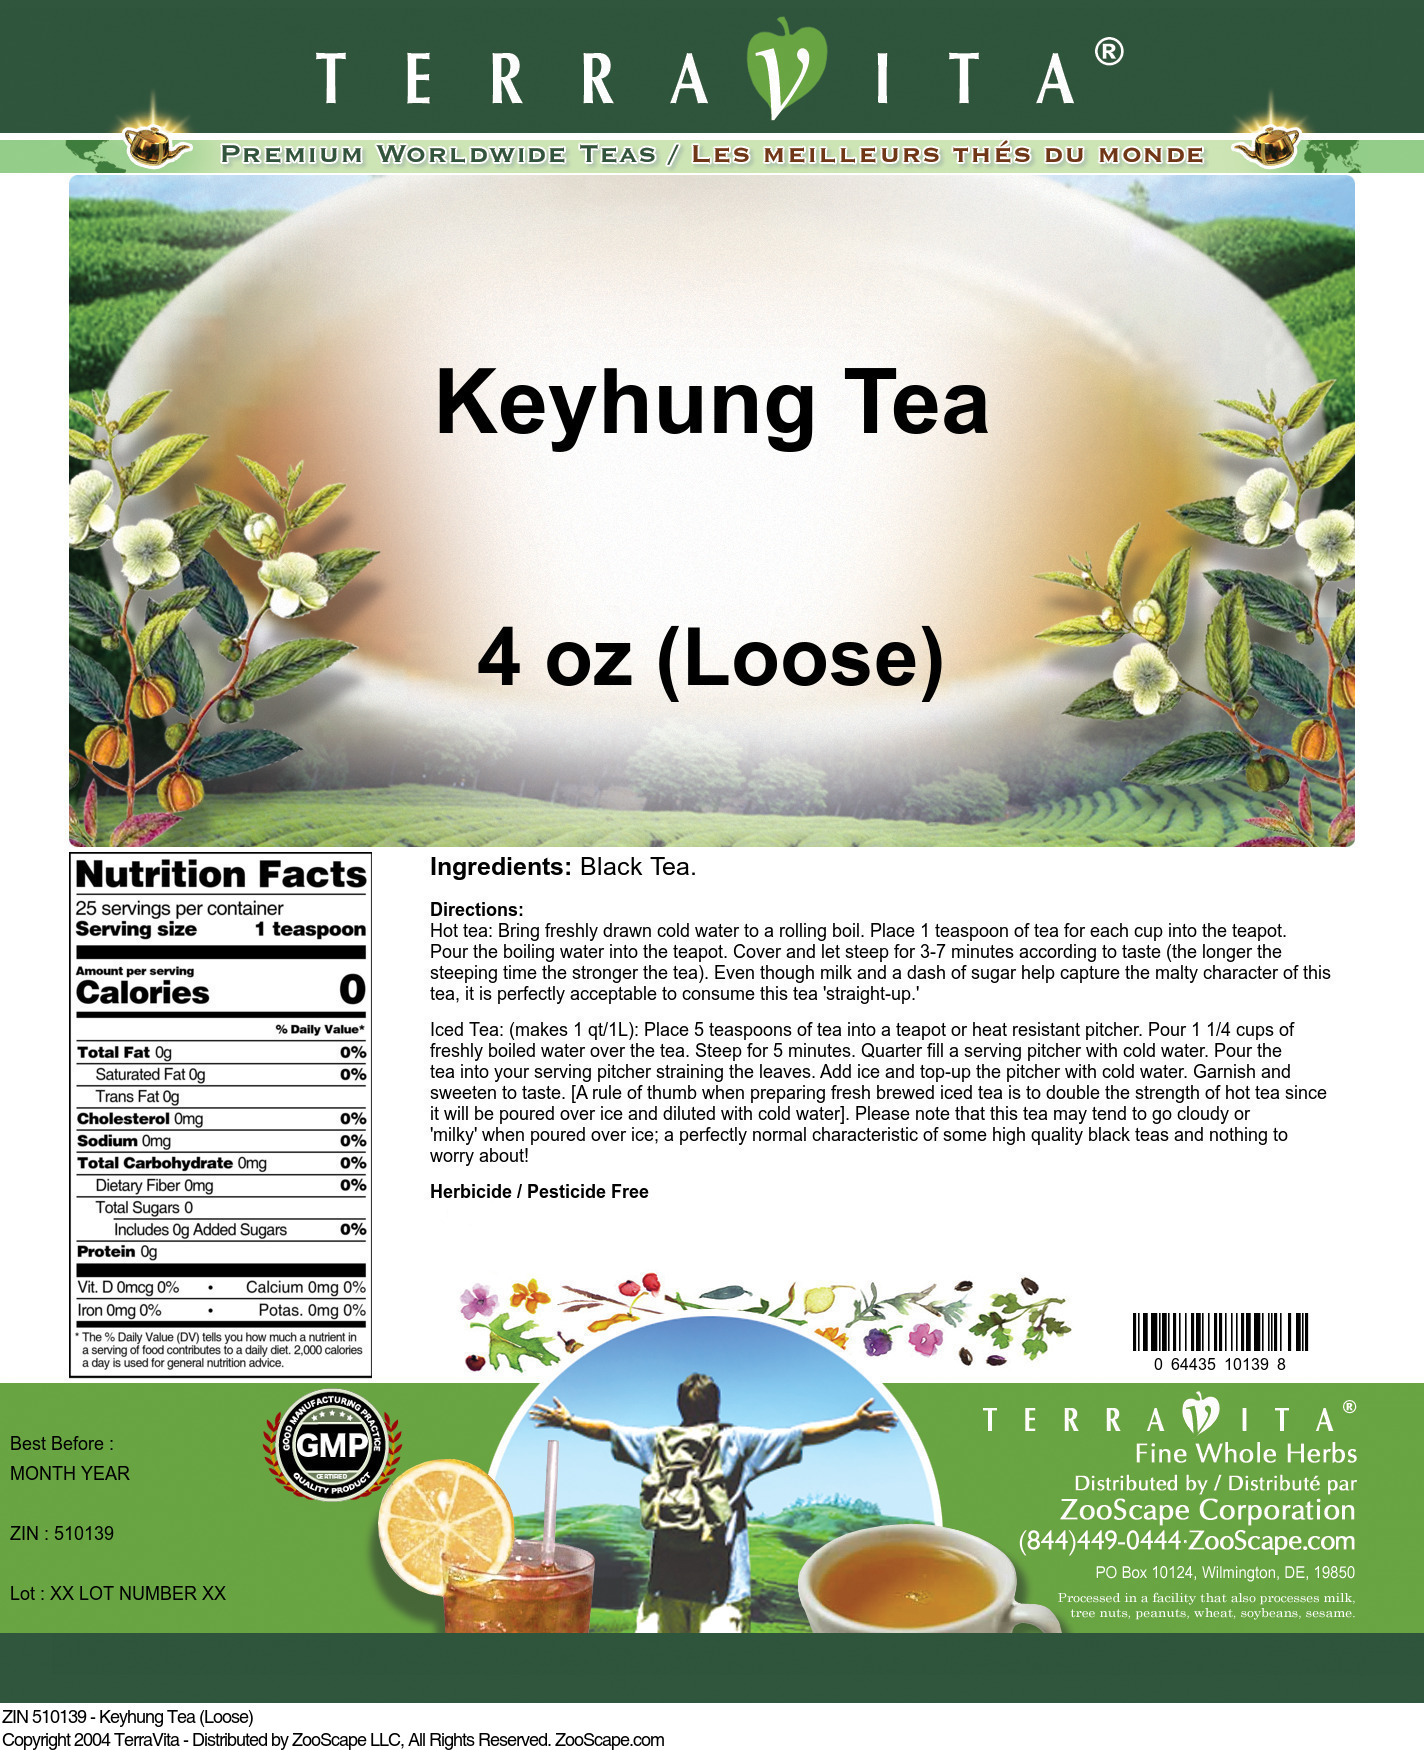 Keyhung Tea (Loose)